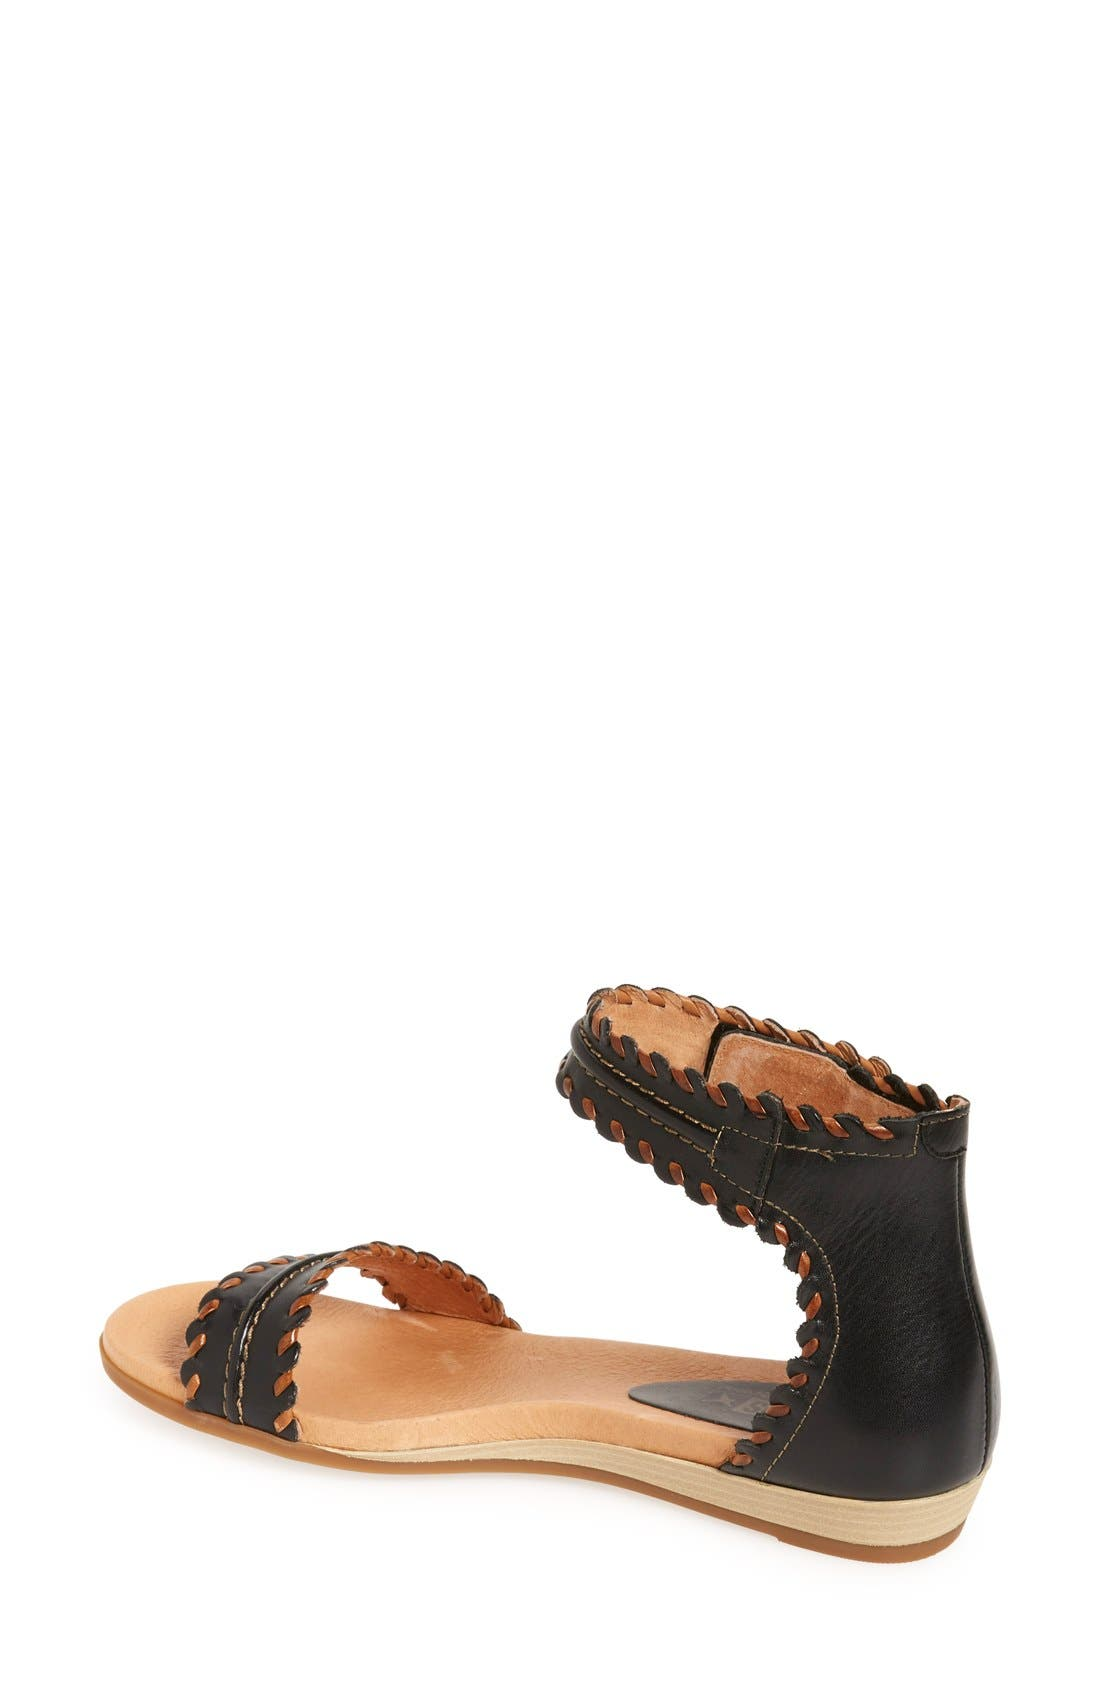 'Alcudia' Ankle Strap Sandal,                             Alternate thumbnail 3, color,                             001